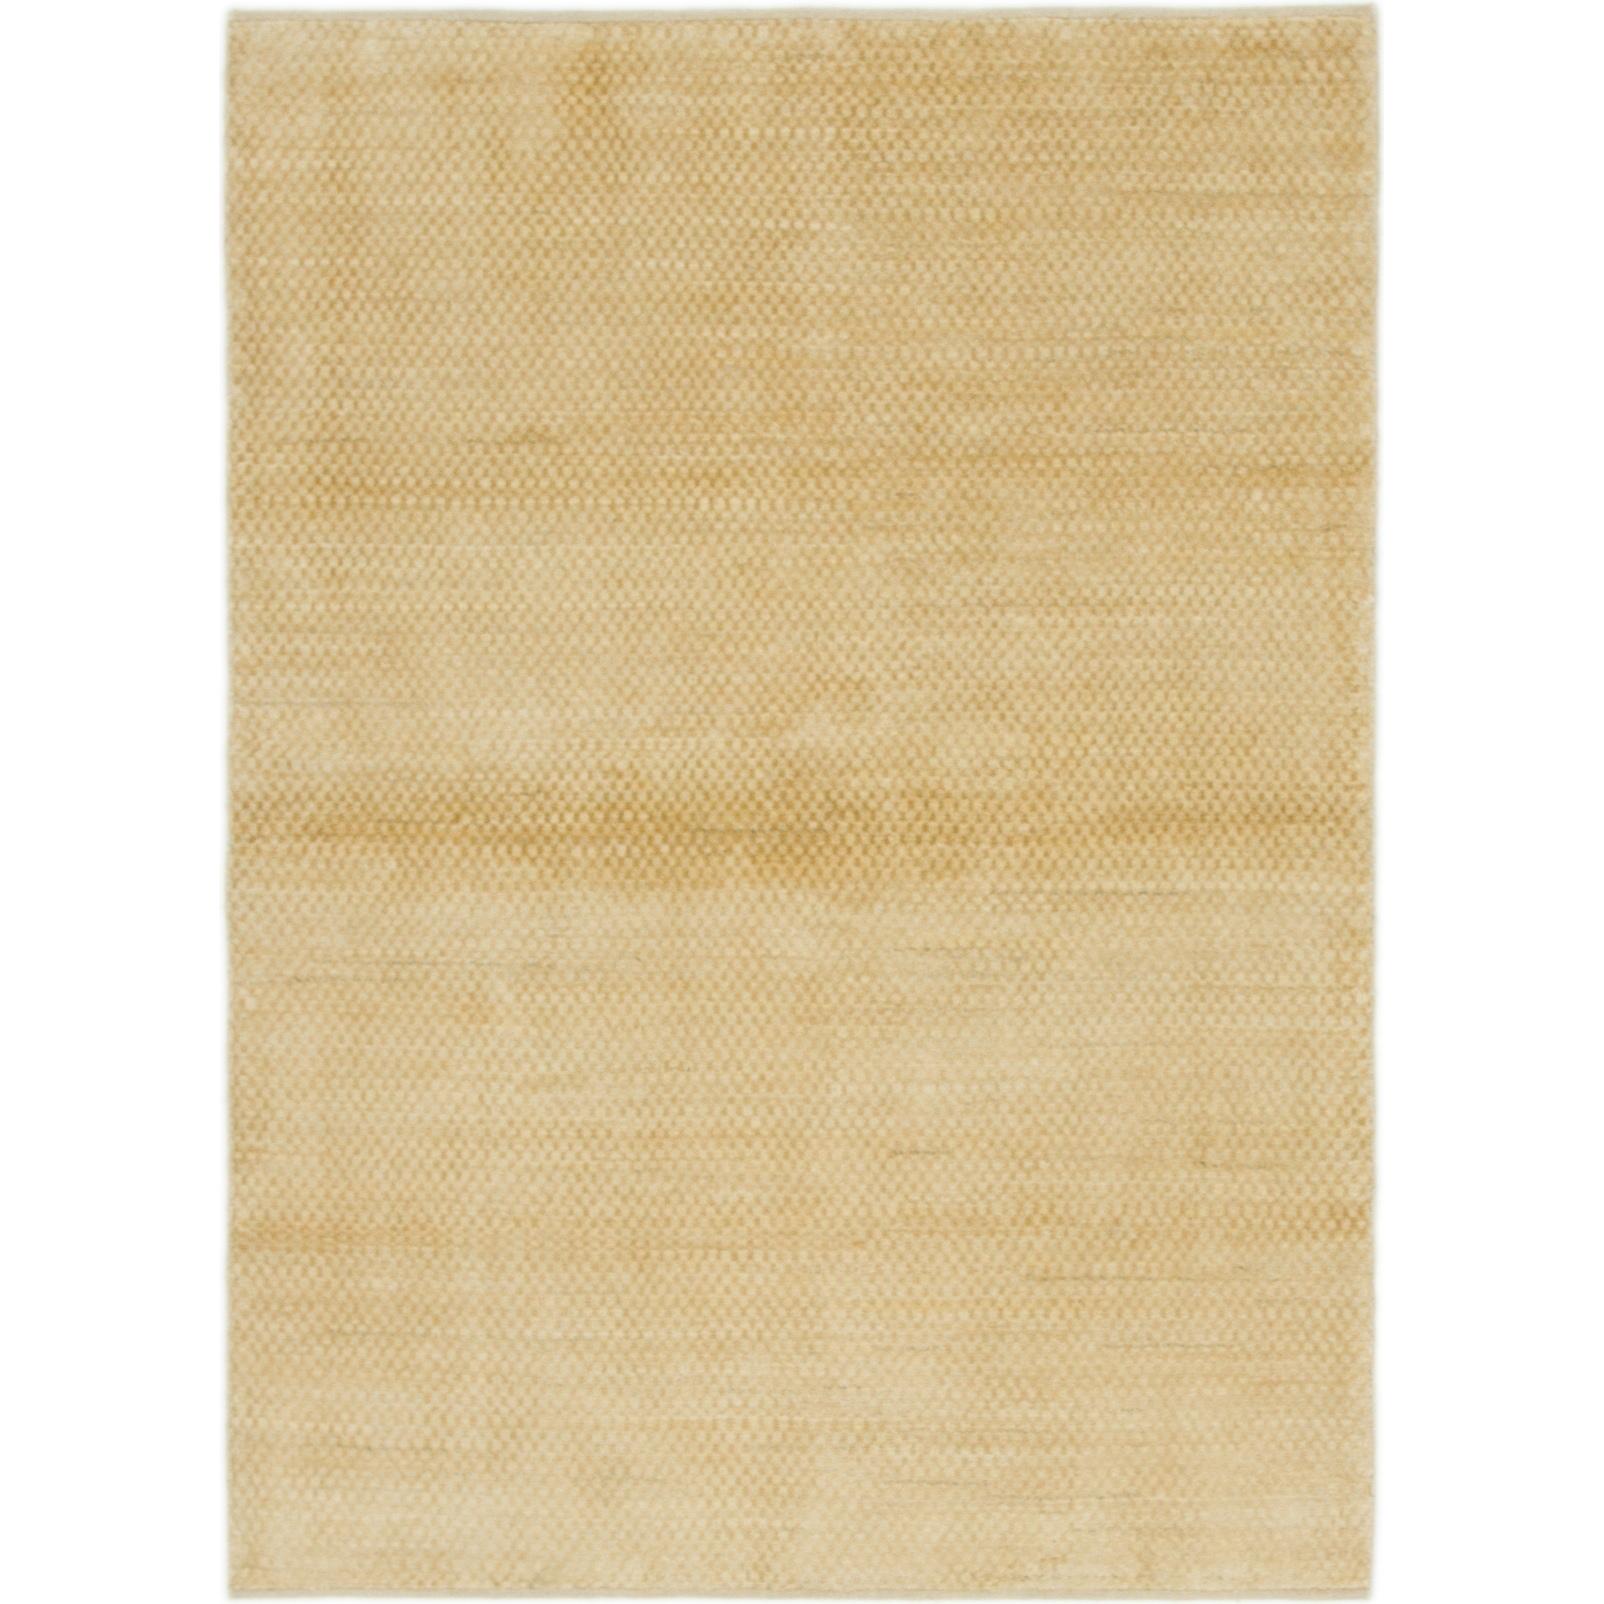 Hand Knotted Kashkuli Gabbeh Wool Area Rug - 4 1 x 5 8 (Ivory - 4 1 x 5 8)